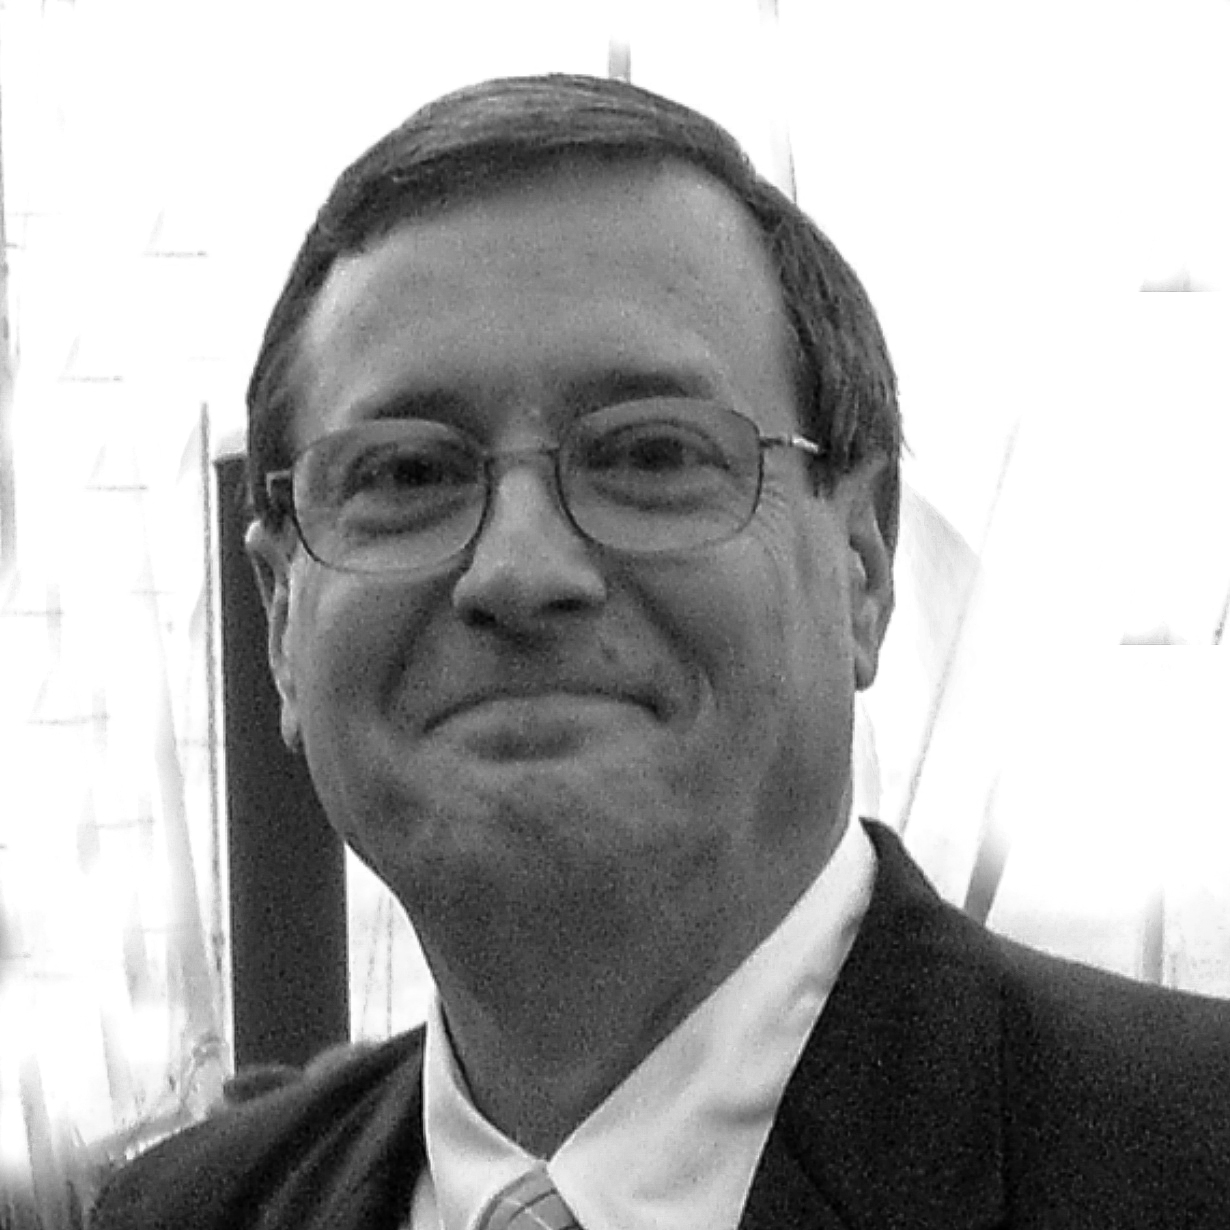 KEVIN W. SIMON